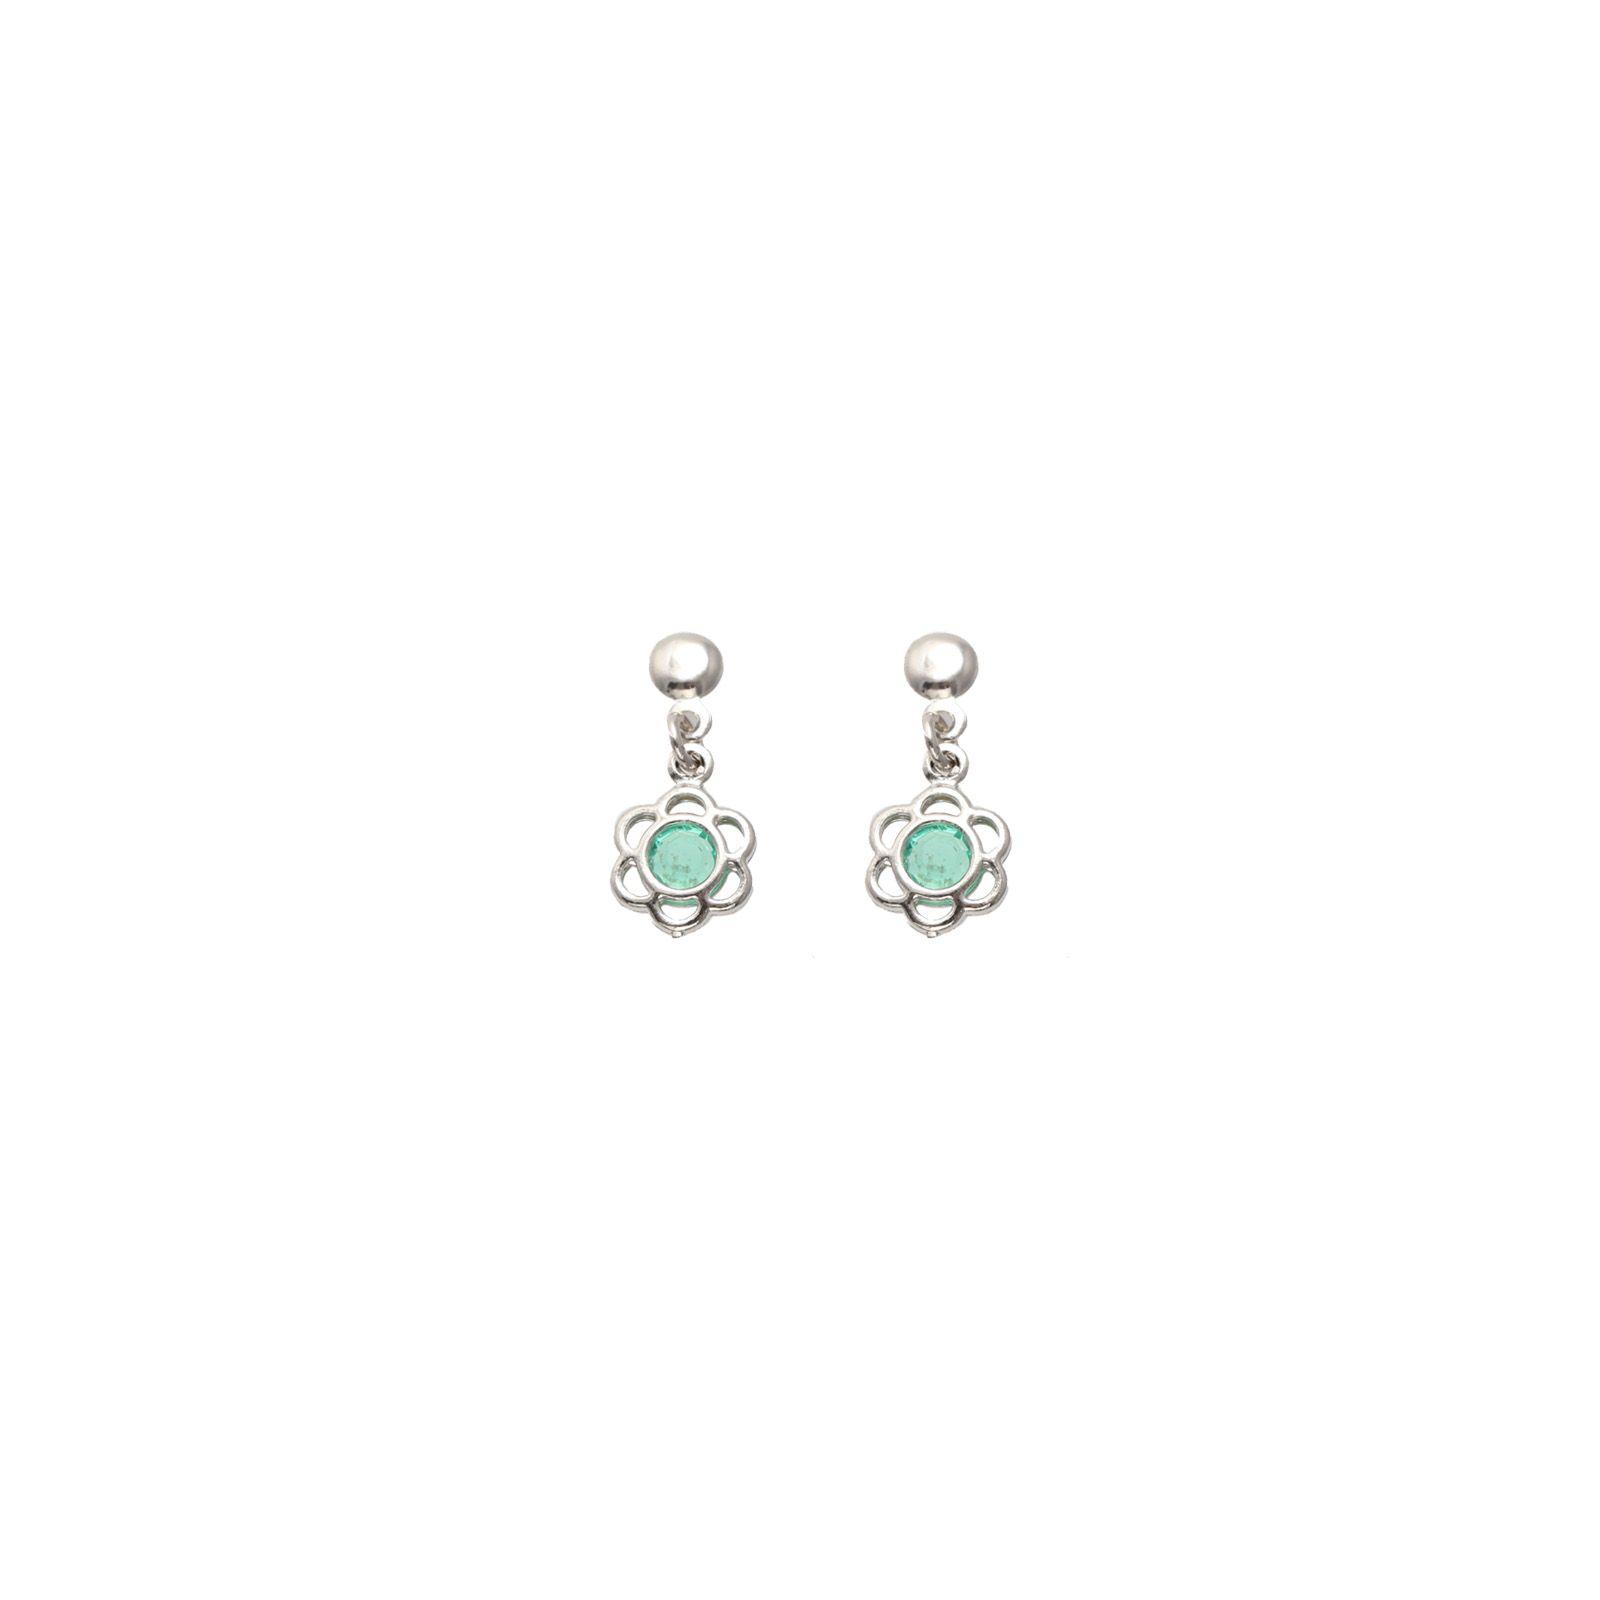 Brinco Mini Flor Verde Folheado a ouro branco (rodihum) 18k mini flor verde. #brinco #brincos #earrings #earring #jewels #jewel #semijoias